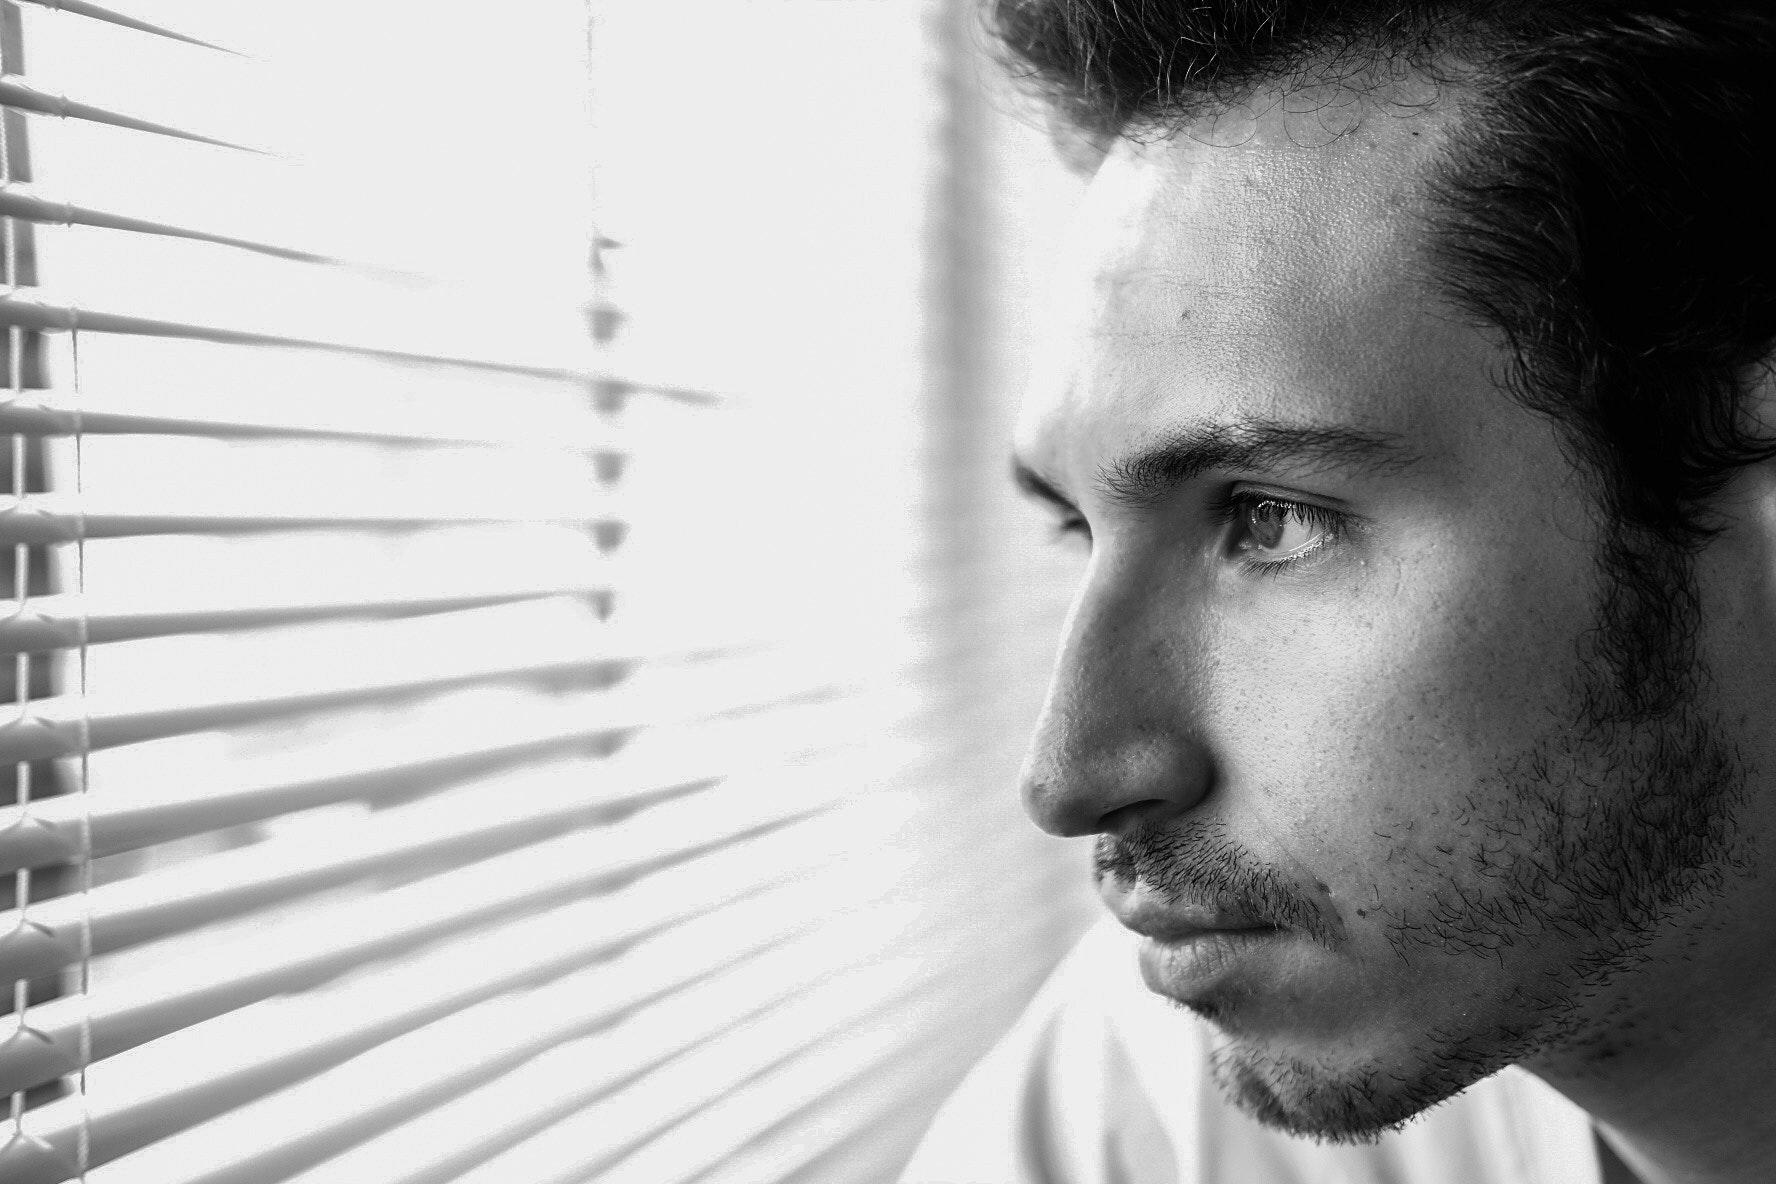 Man looking through window photo